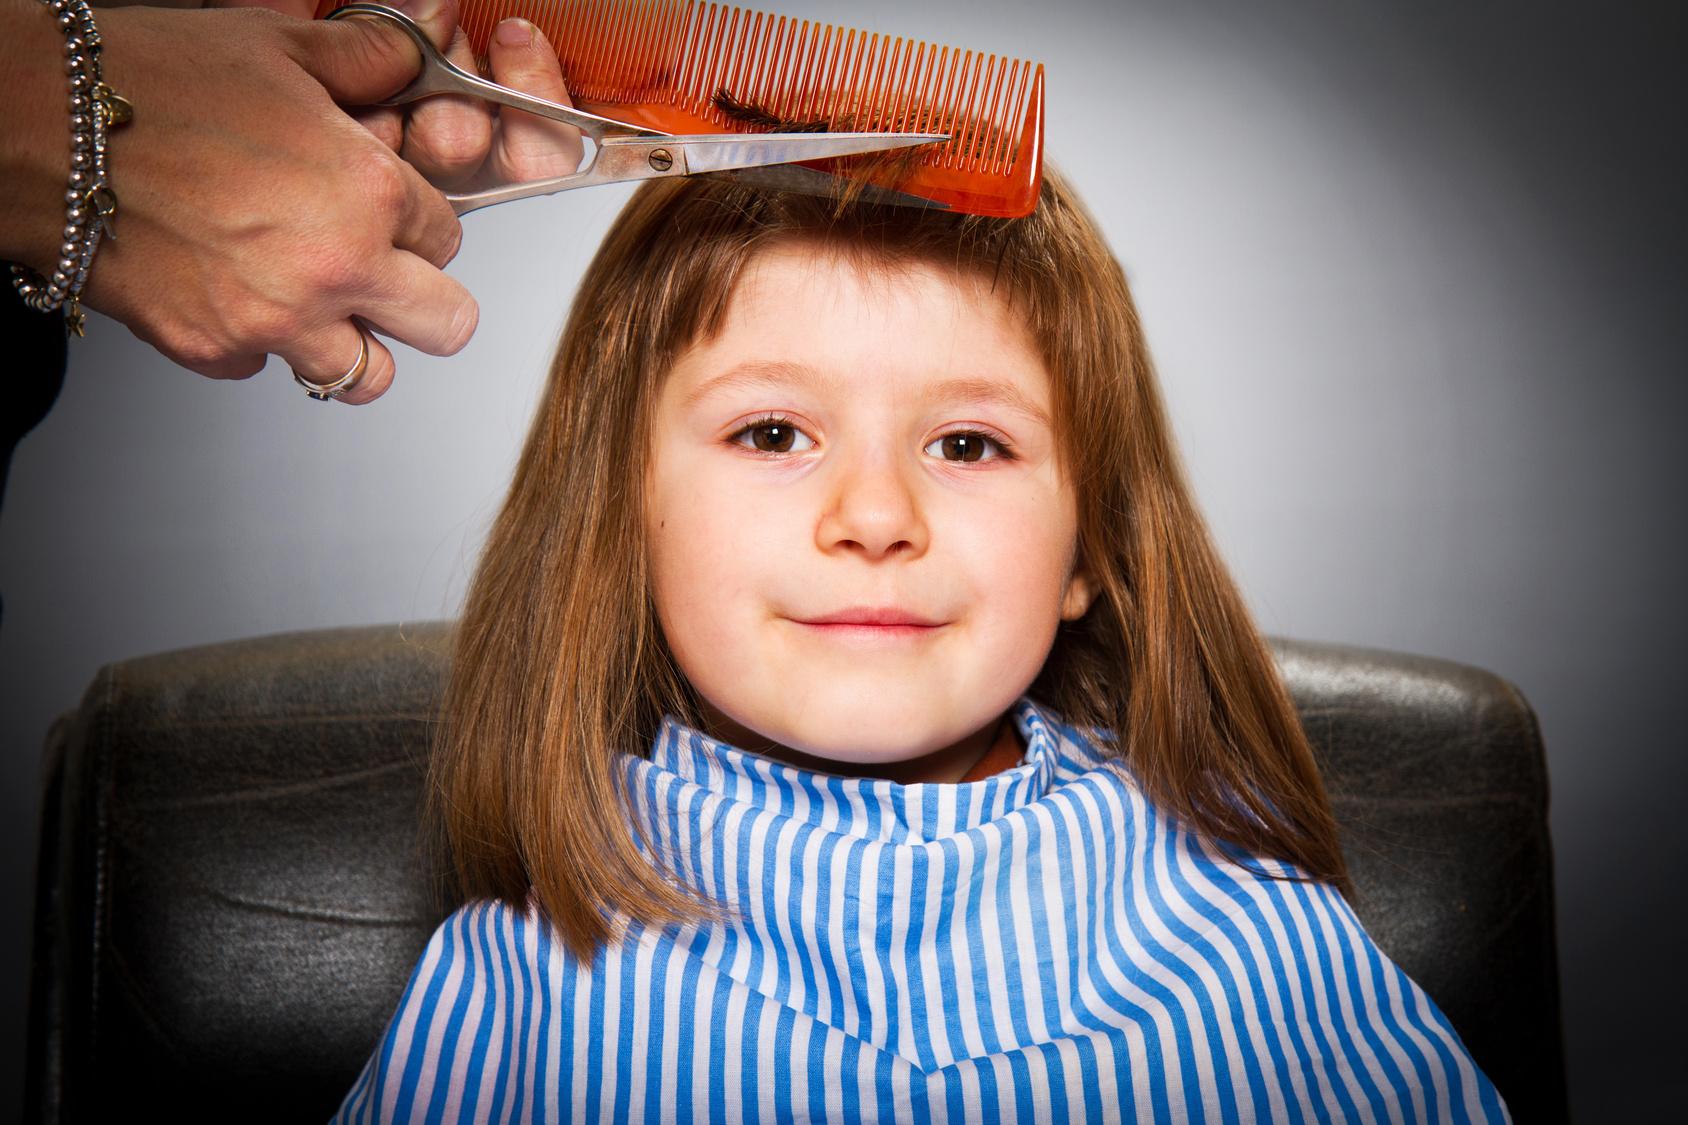 img 5a254d943d755.png - お母さん必見!子どもの髪型に失敗しないカットの基本テクニック